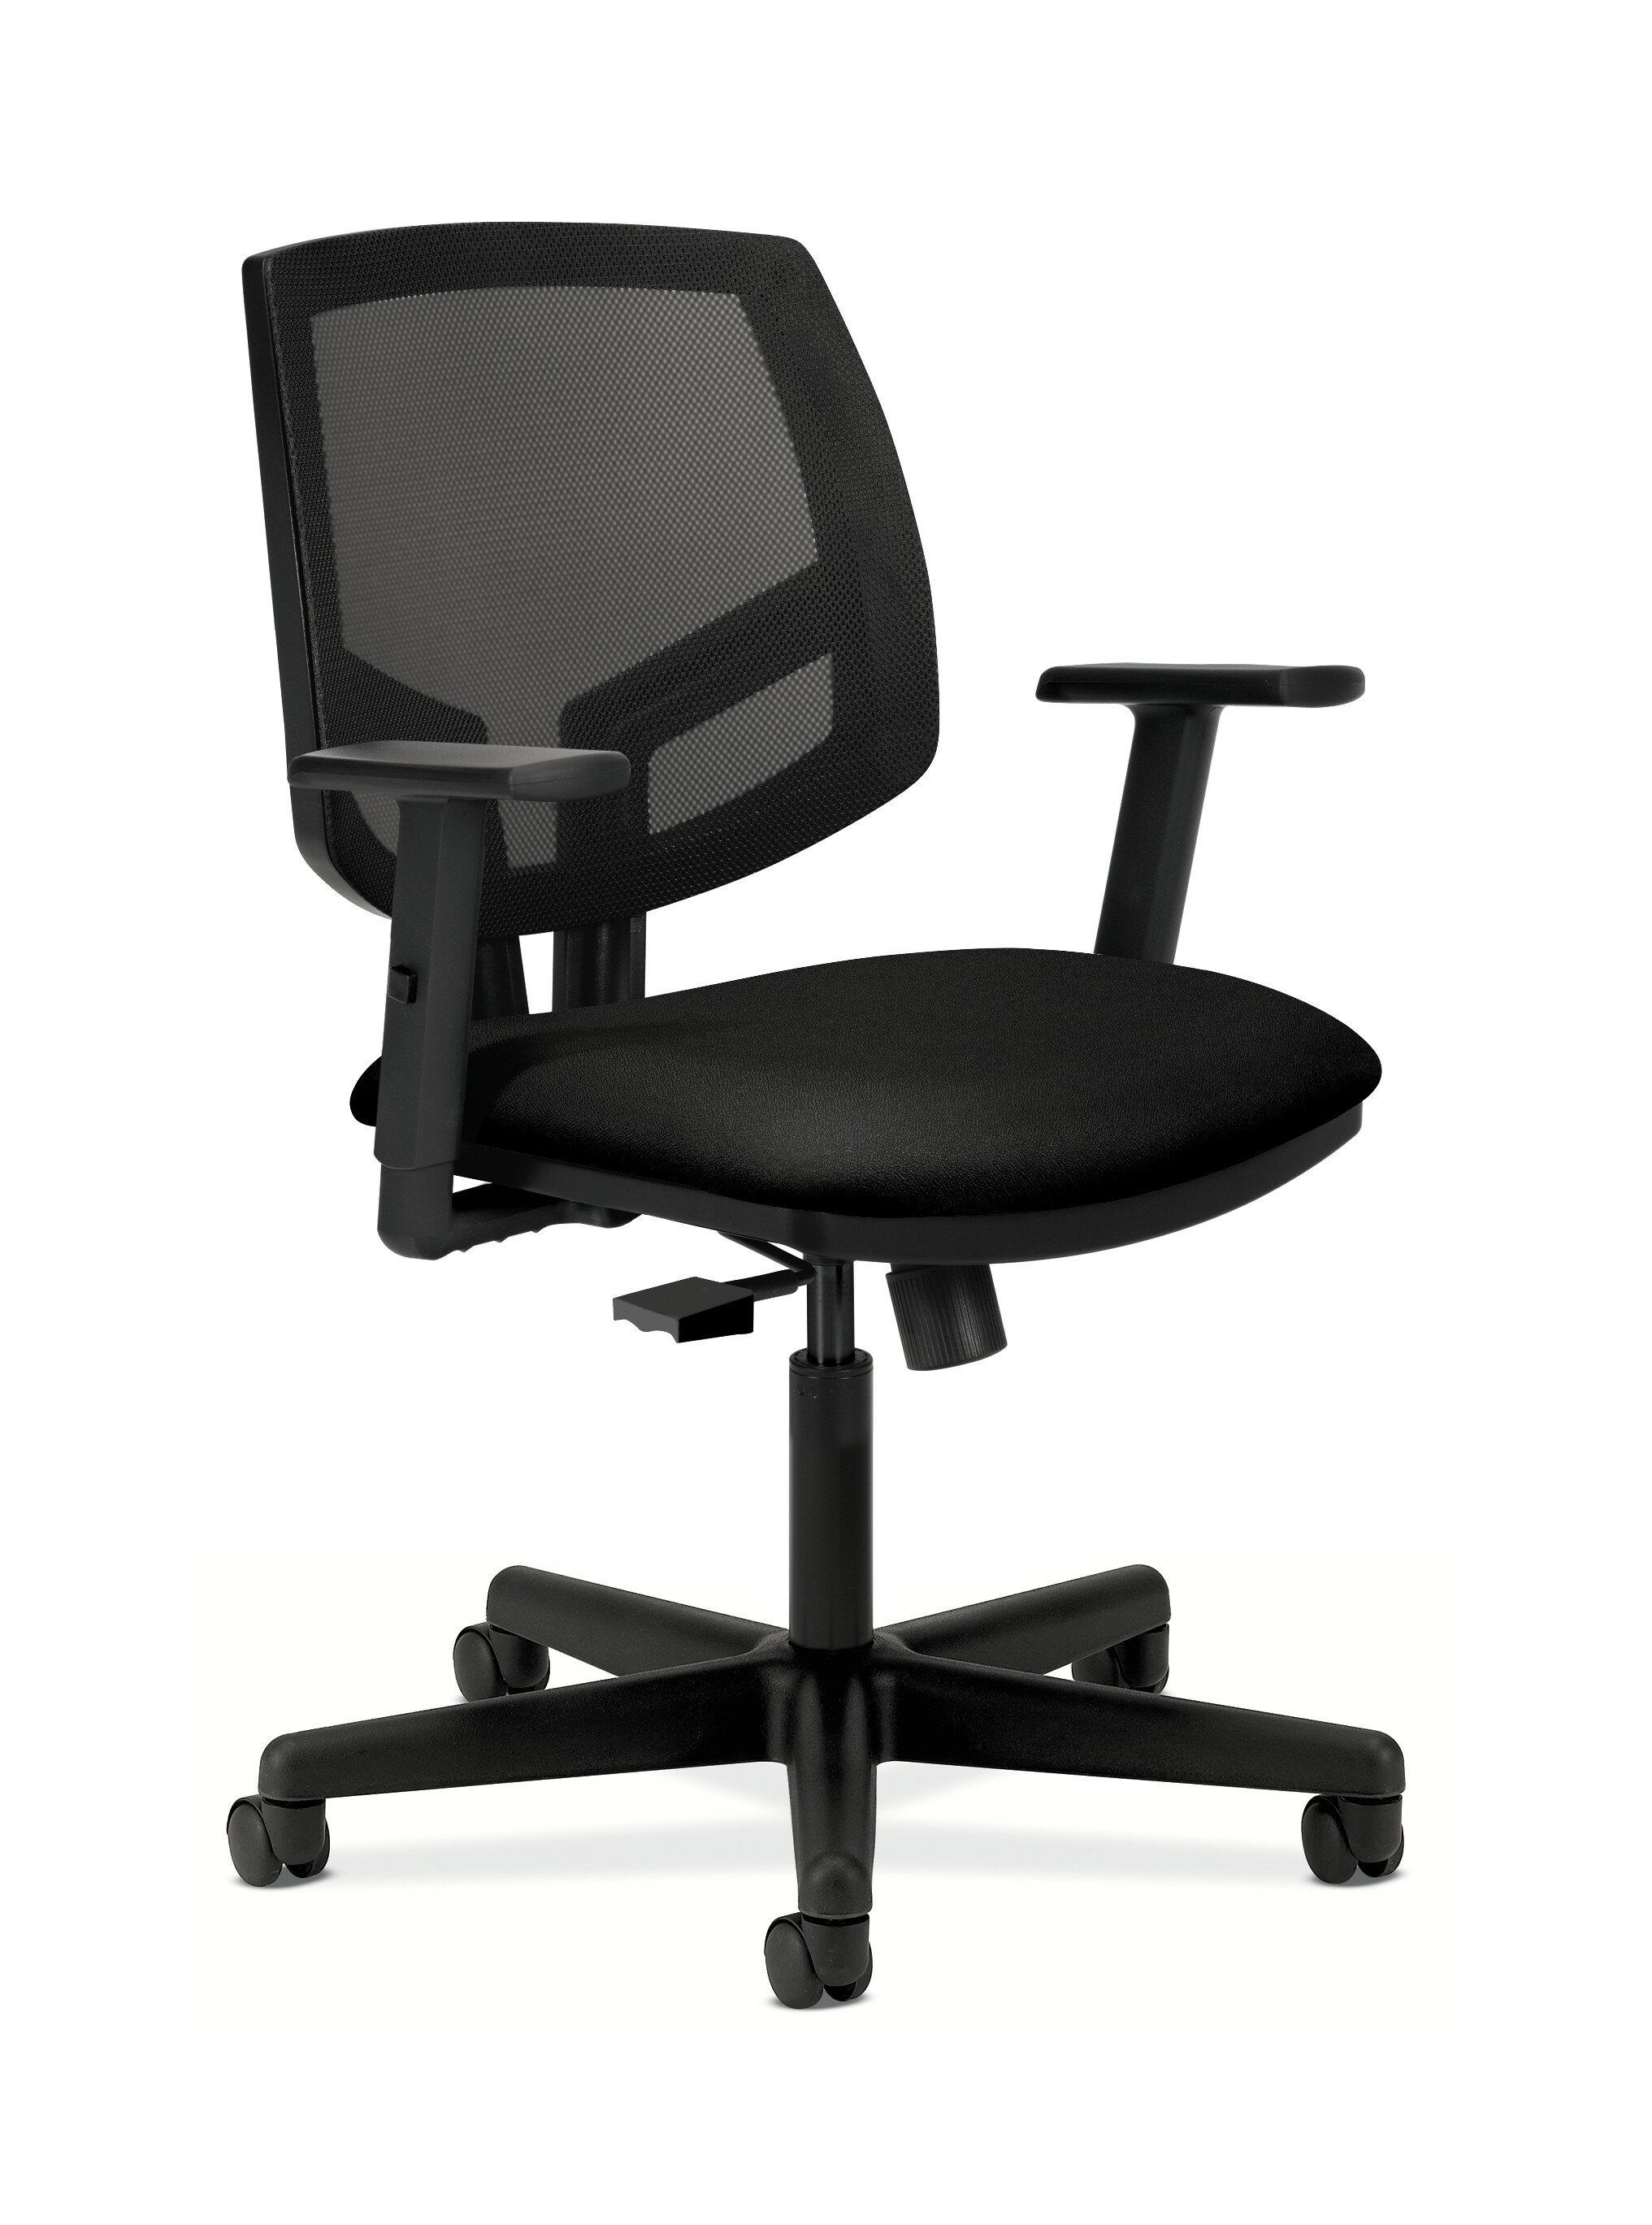 Hon Volt Mesh Back Task Chair Synchro Tilt Tension Lock Adjustable Arms Black Fabric